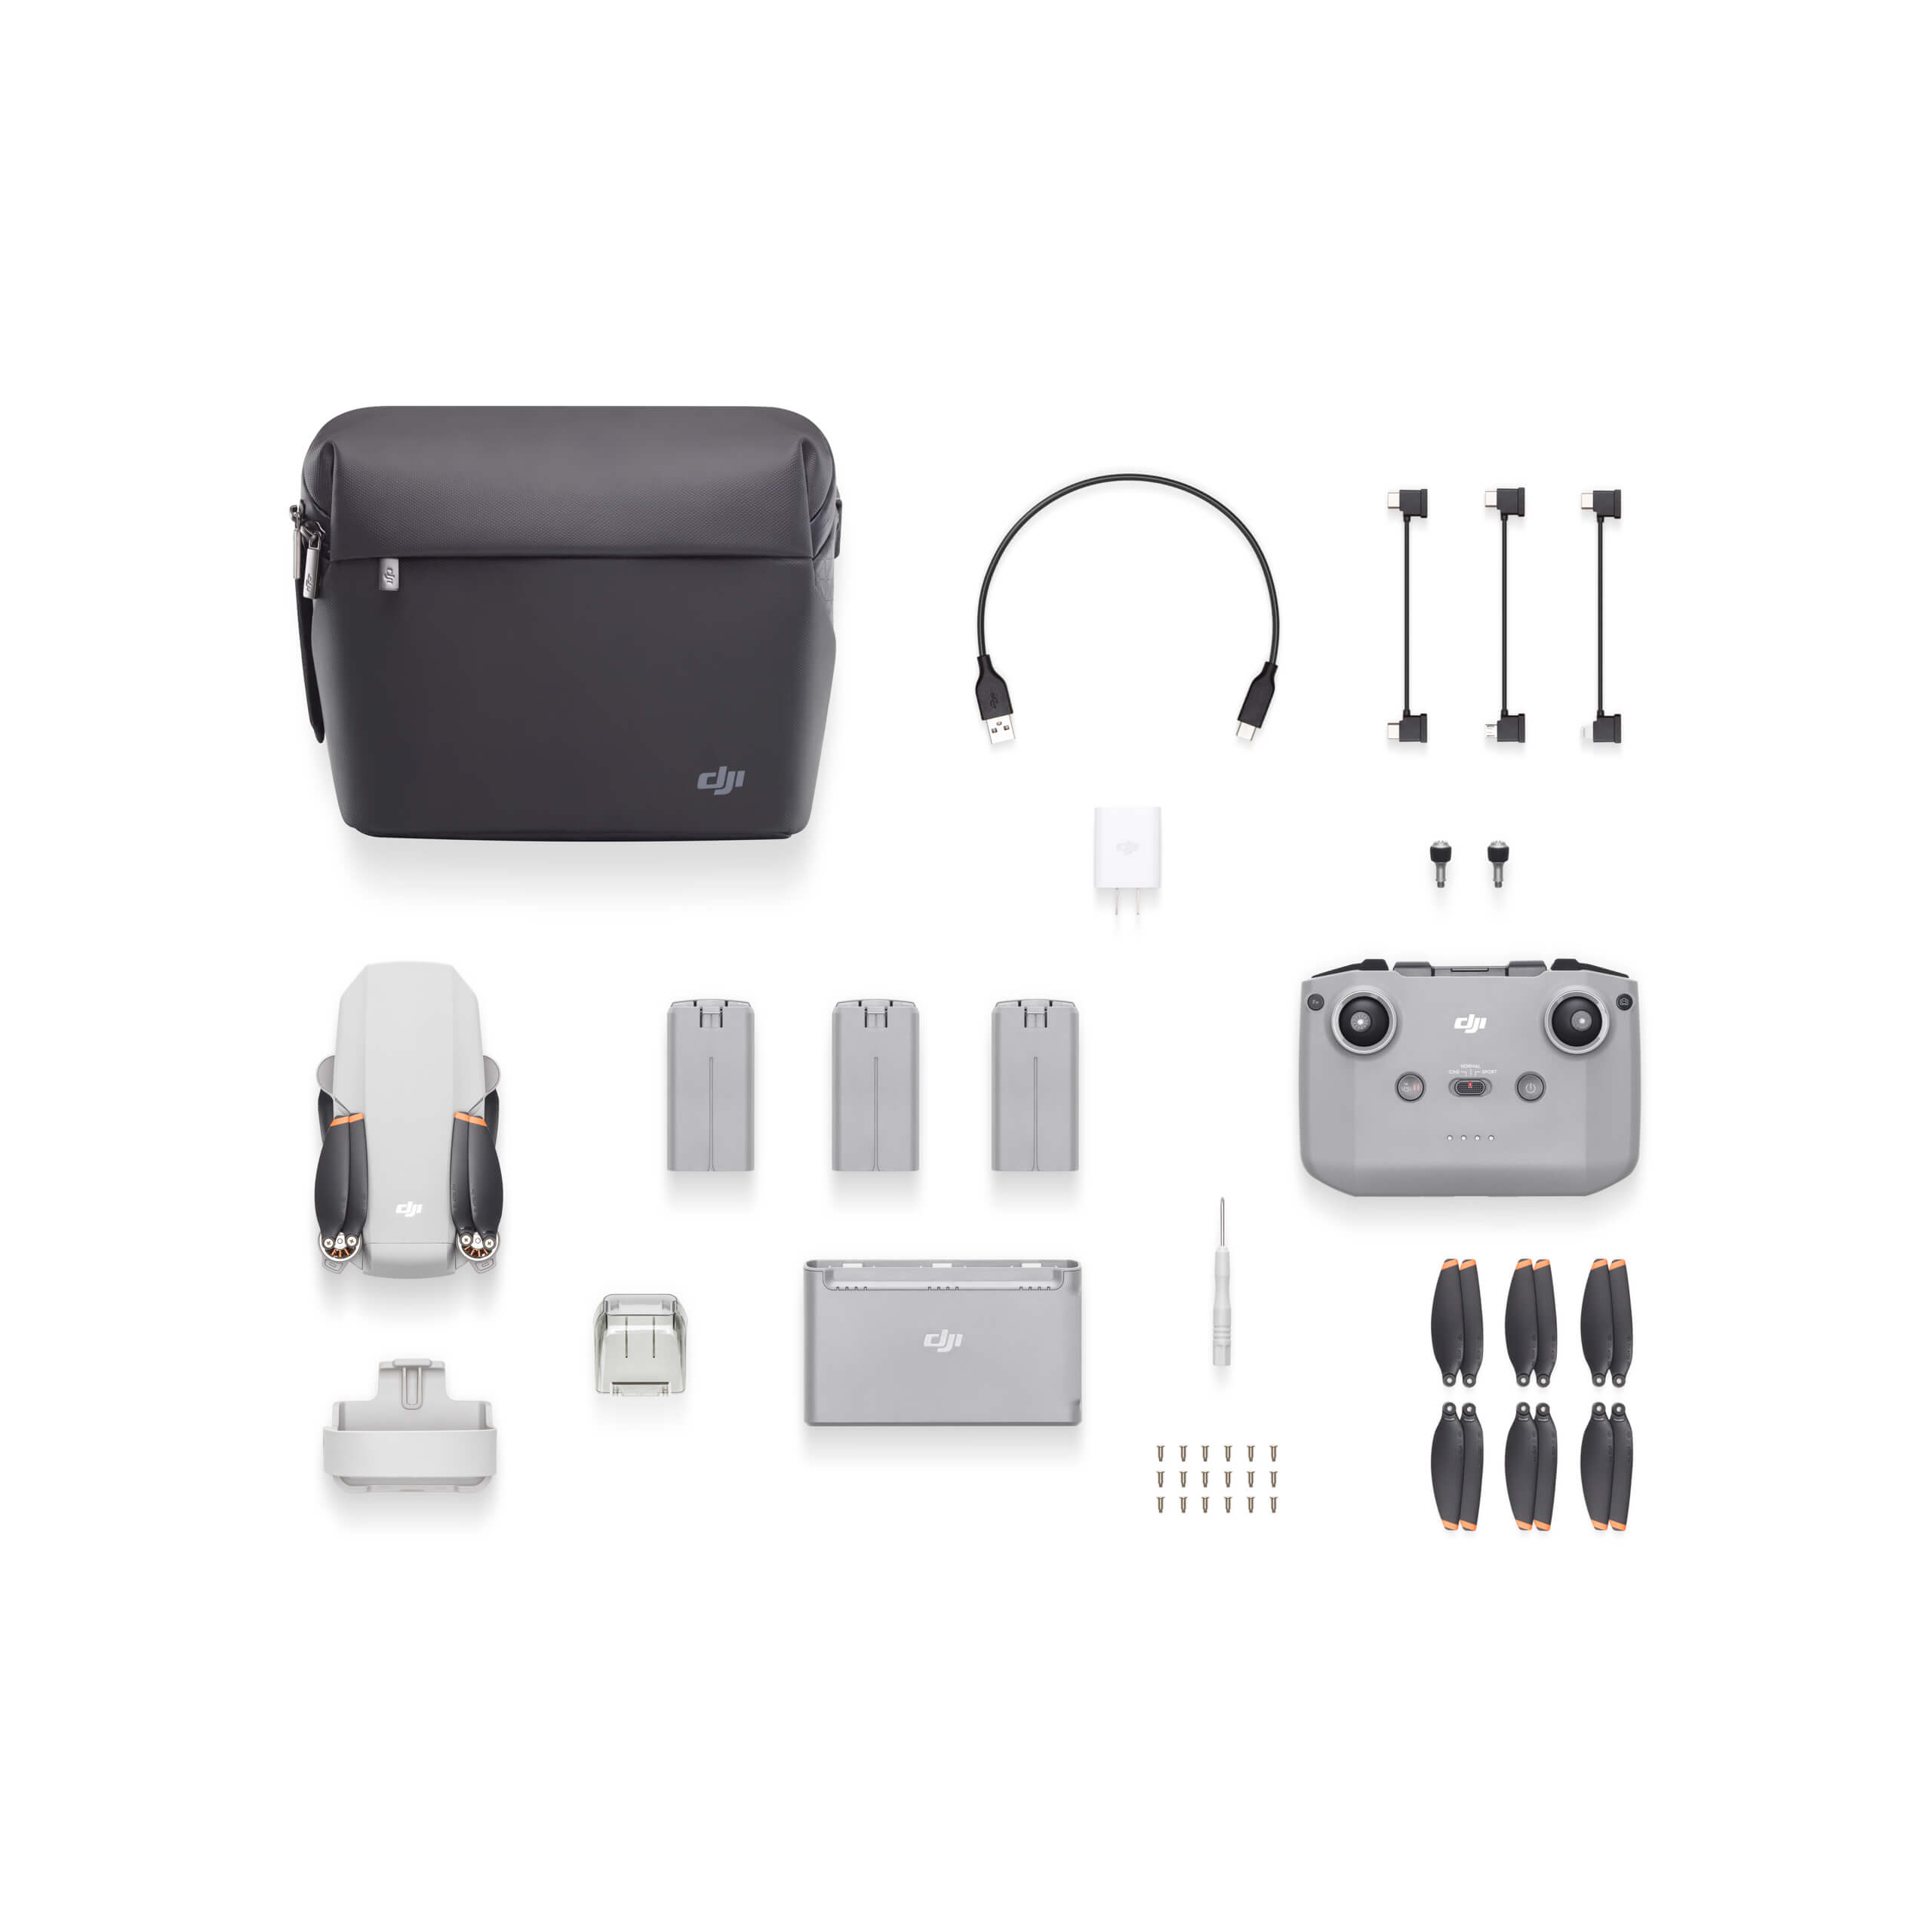 DJI Mini 2S beginner drone